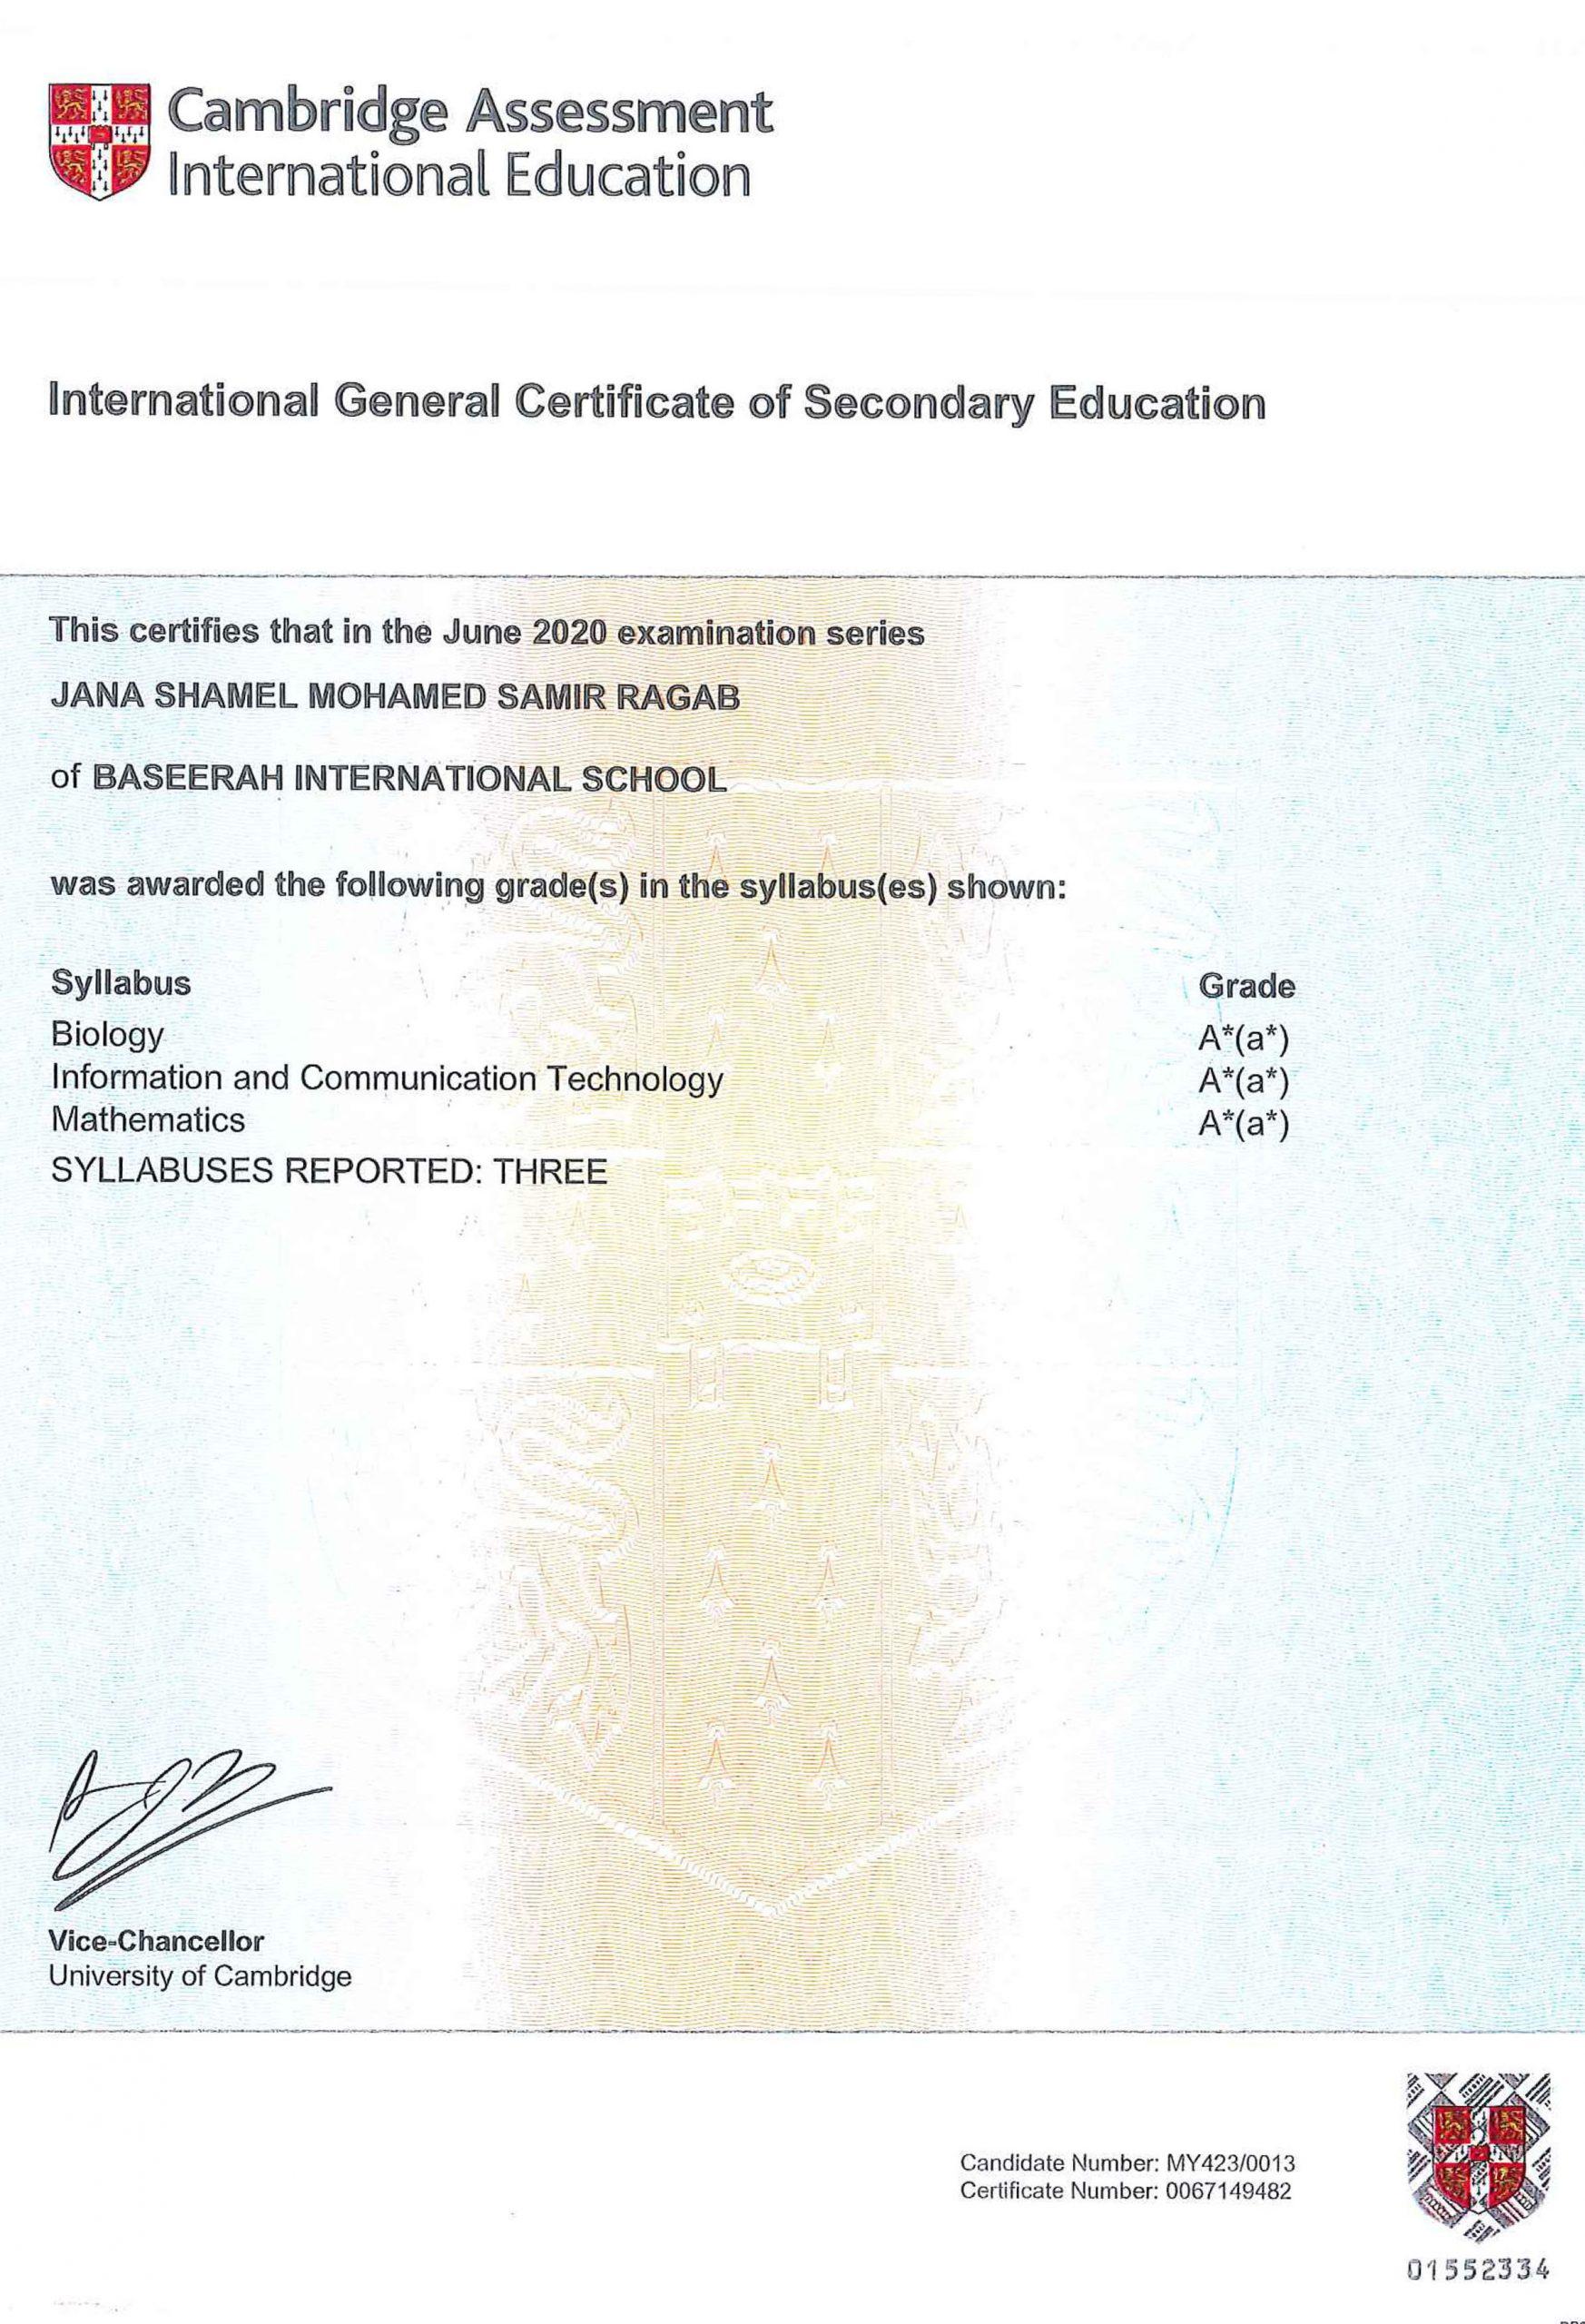 Jana Shamel Mohamed High Achievement Award for Cambridge IGCSE